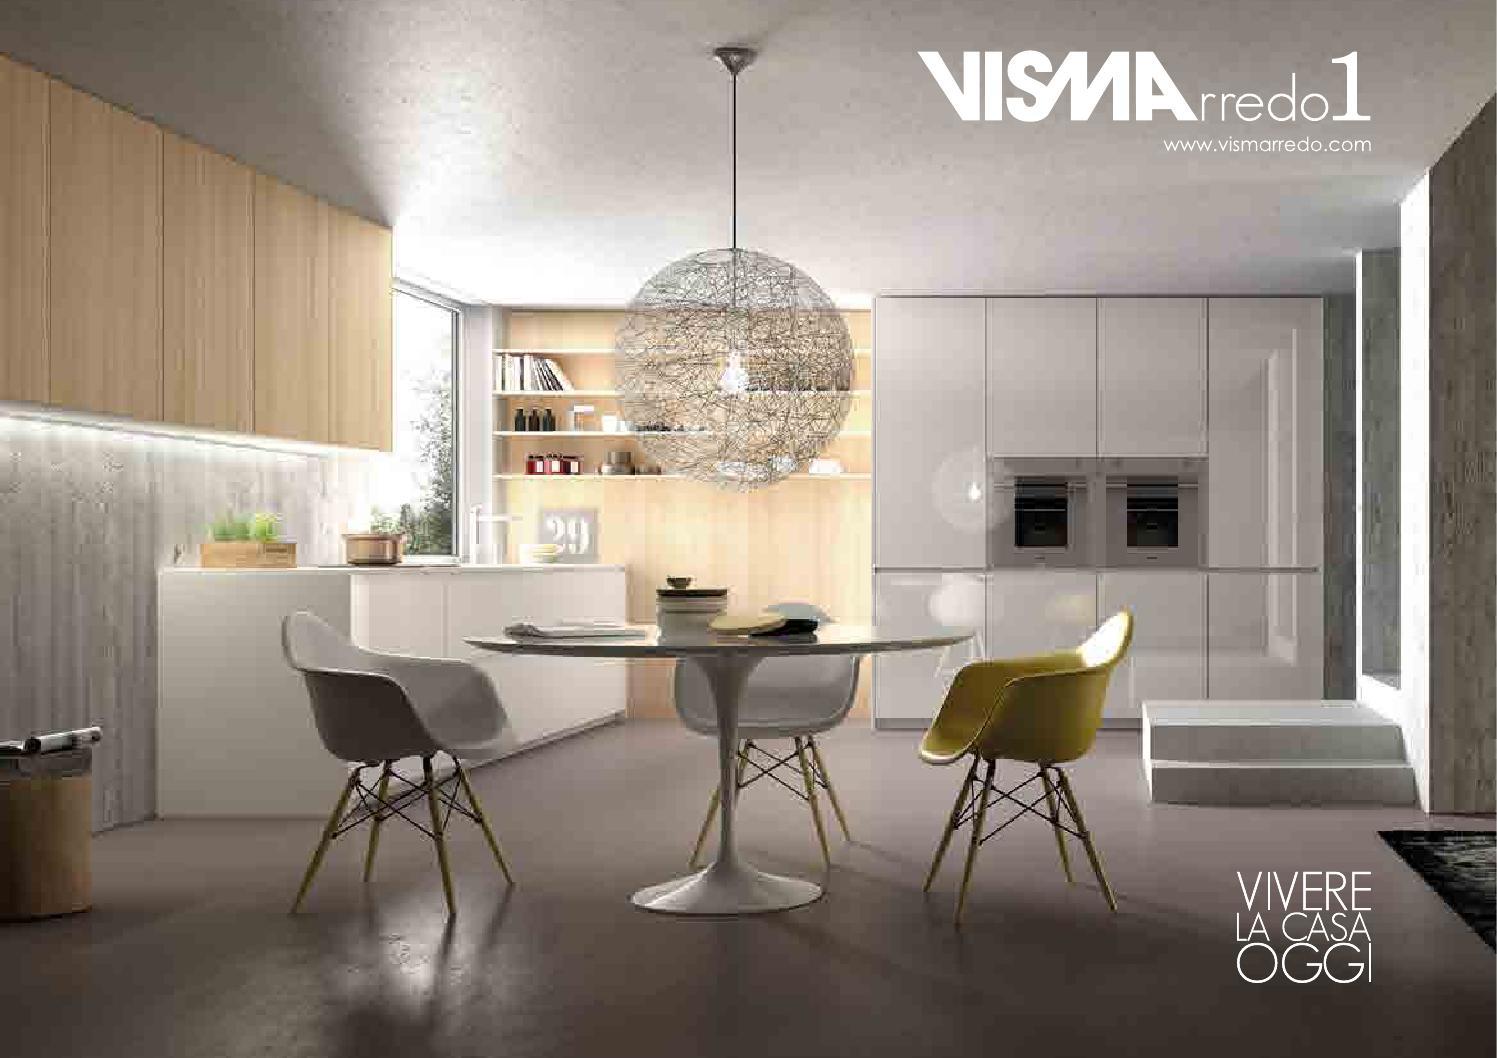 Catalogo Visma Arredo 2016 by Visma Arredo 1 Srl - issuu